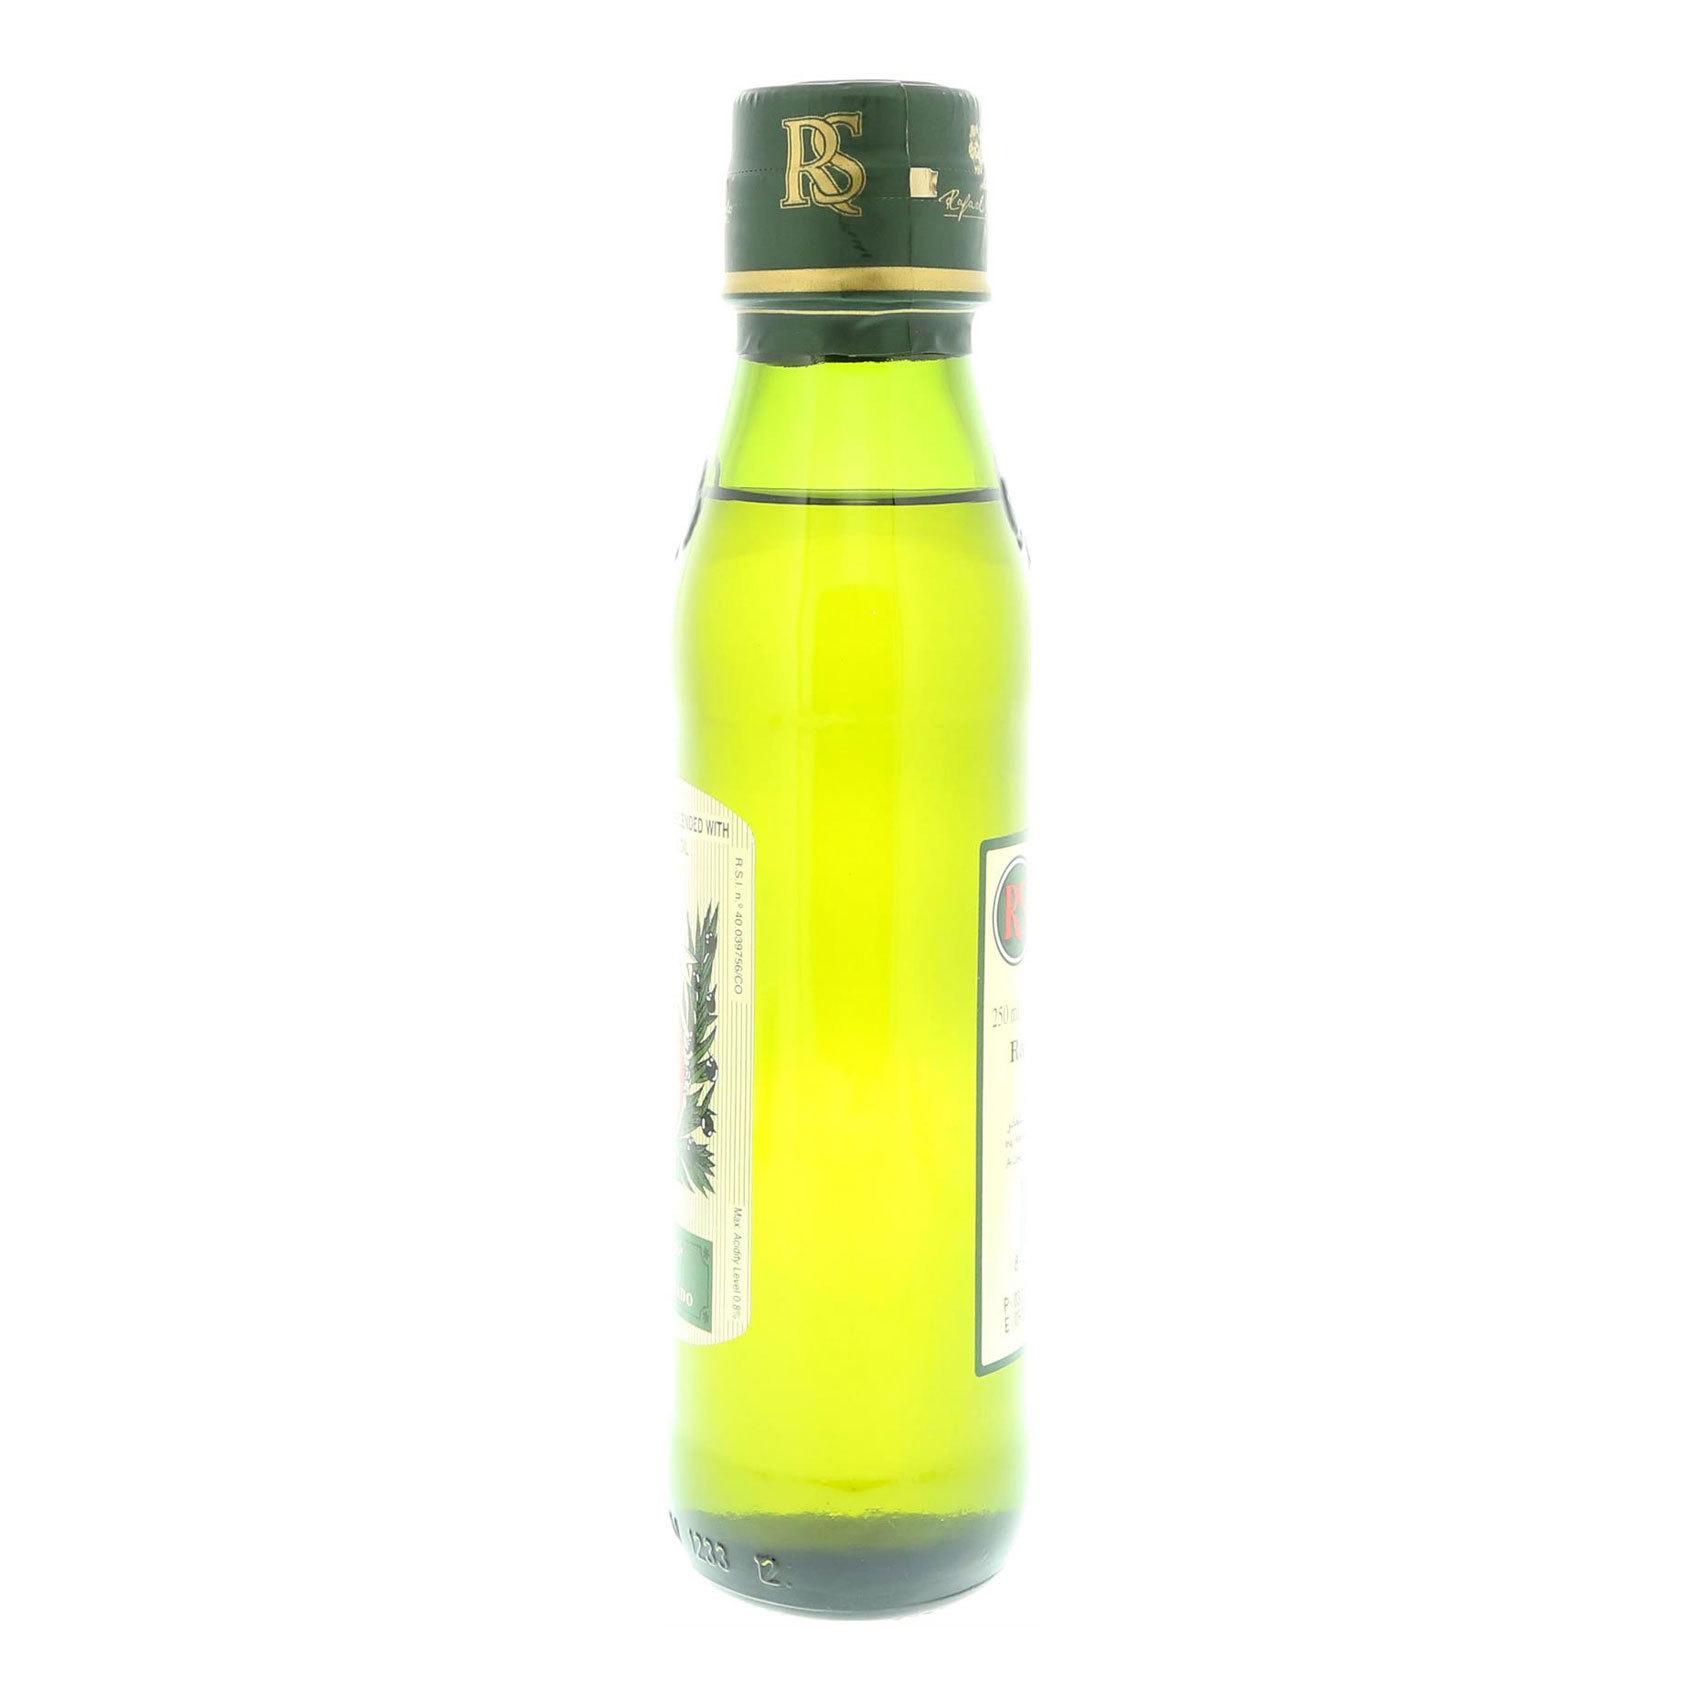 RS POMACE OLIVE OIL 250ML